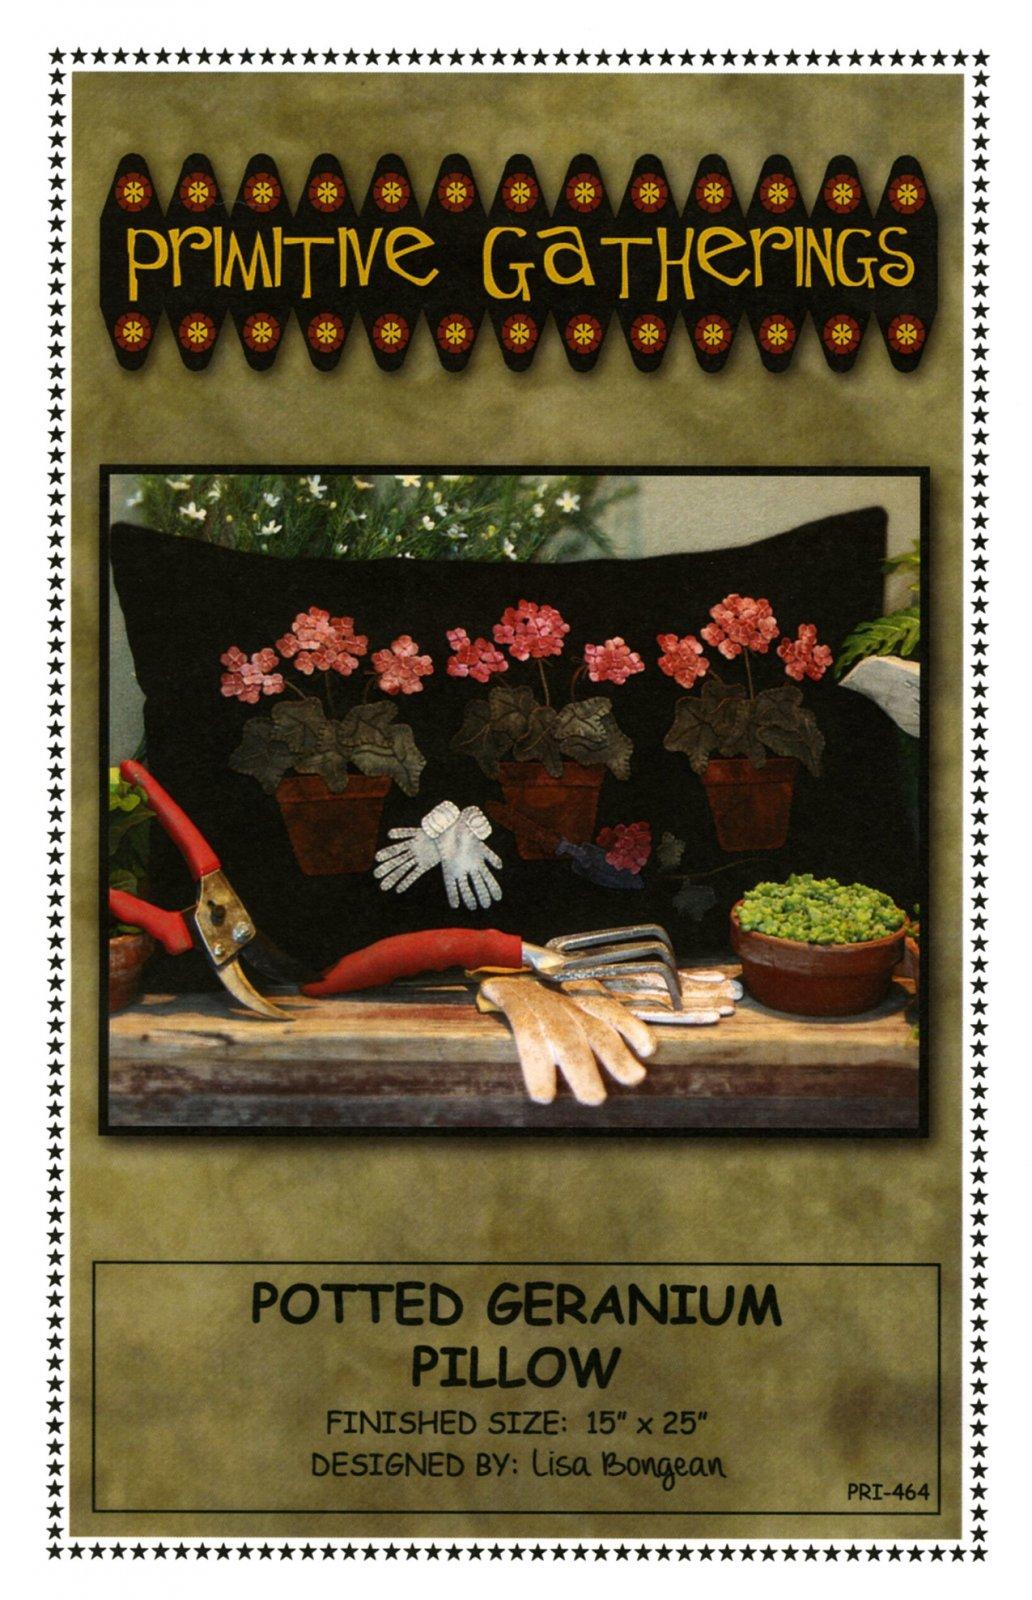 Potted Geranium Pillow Pattern